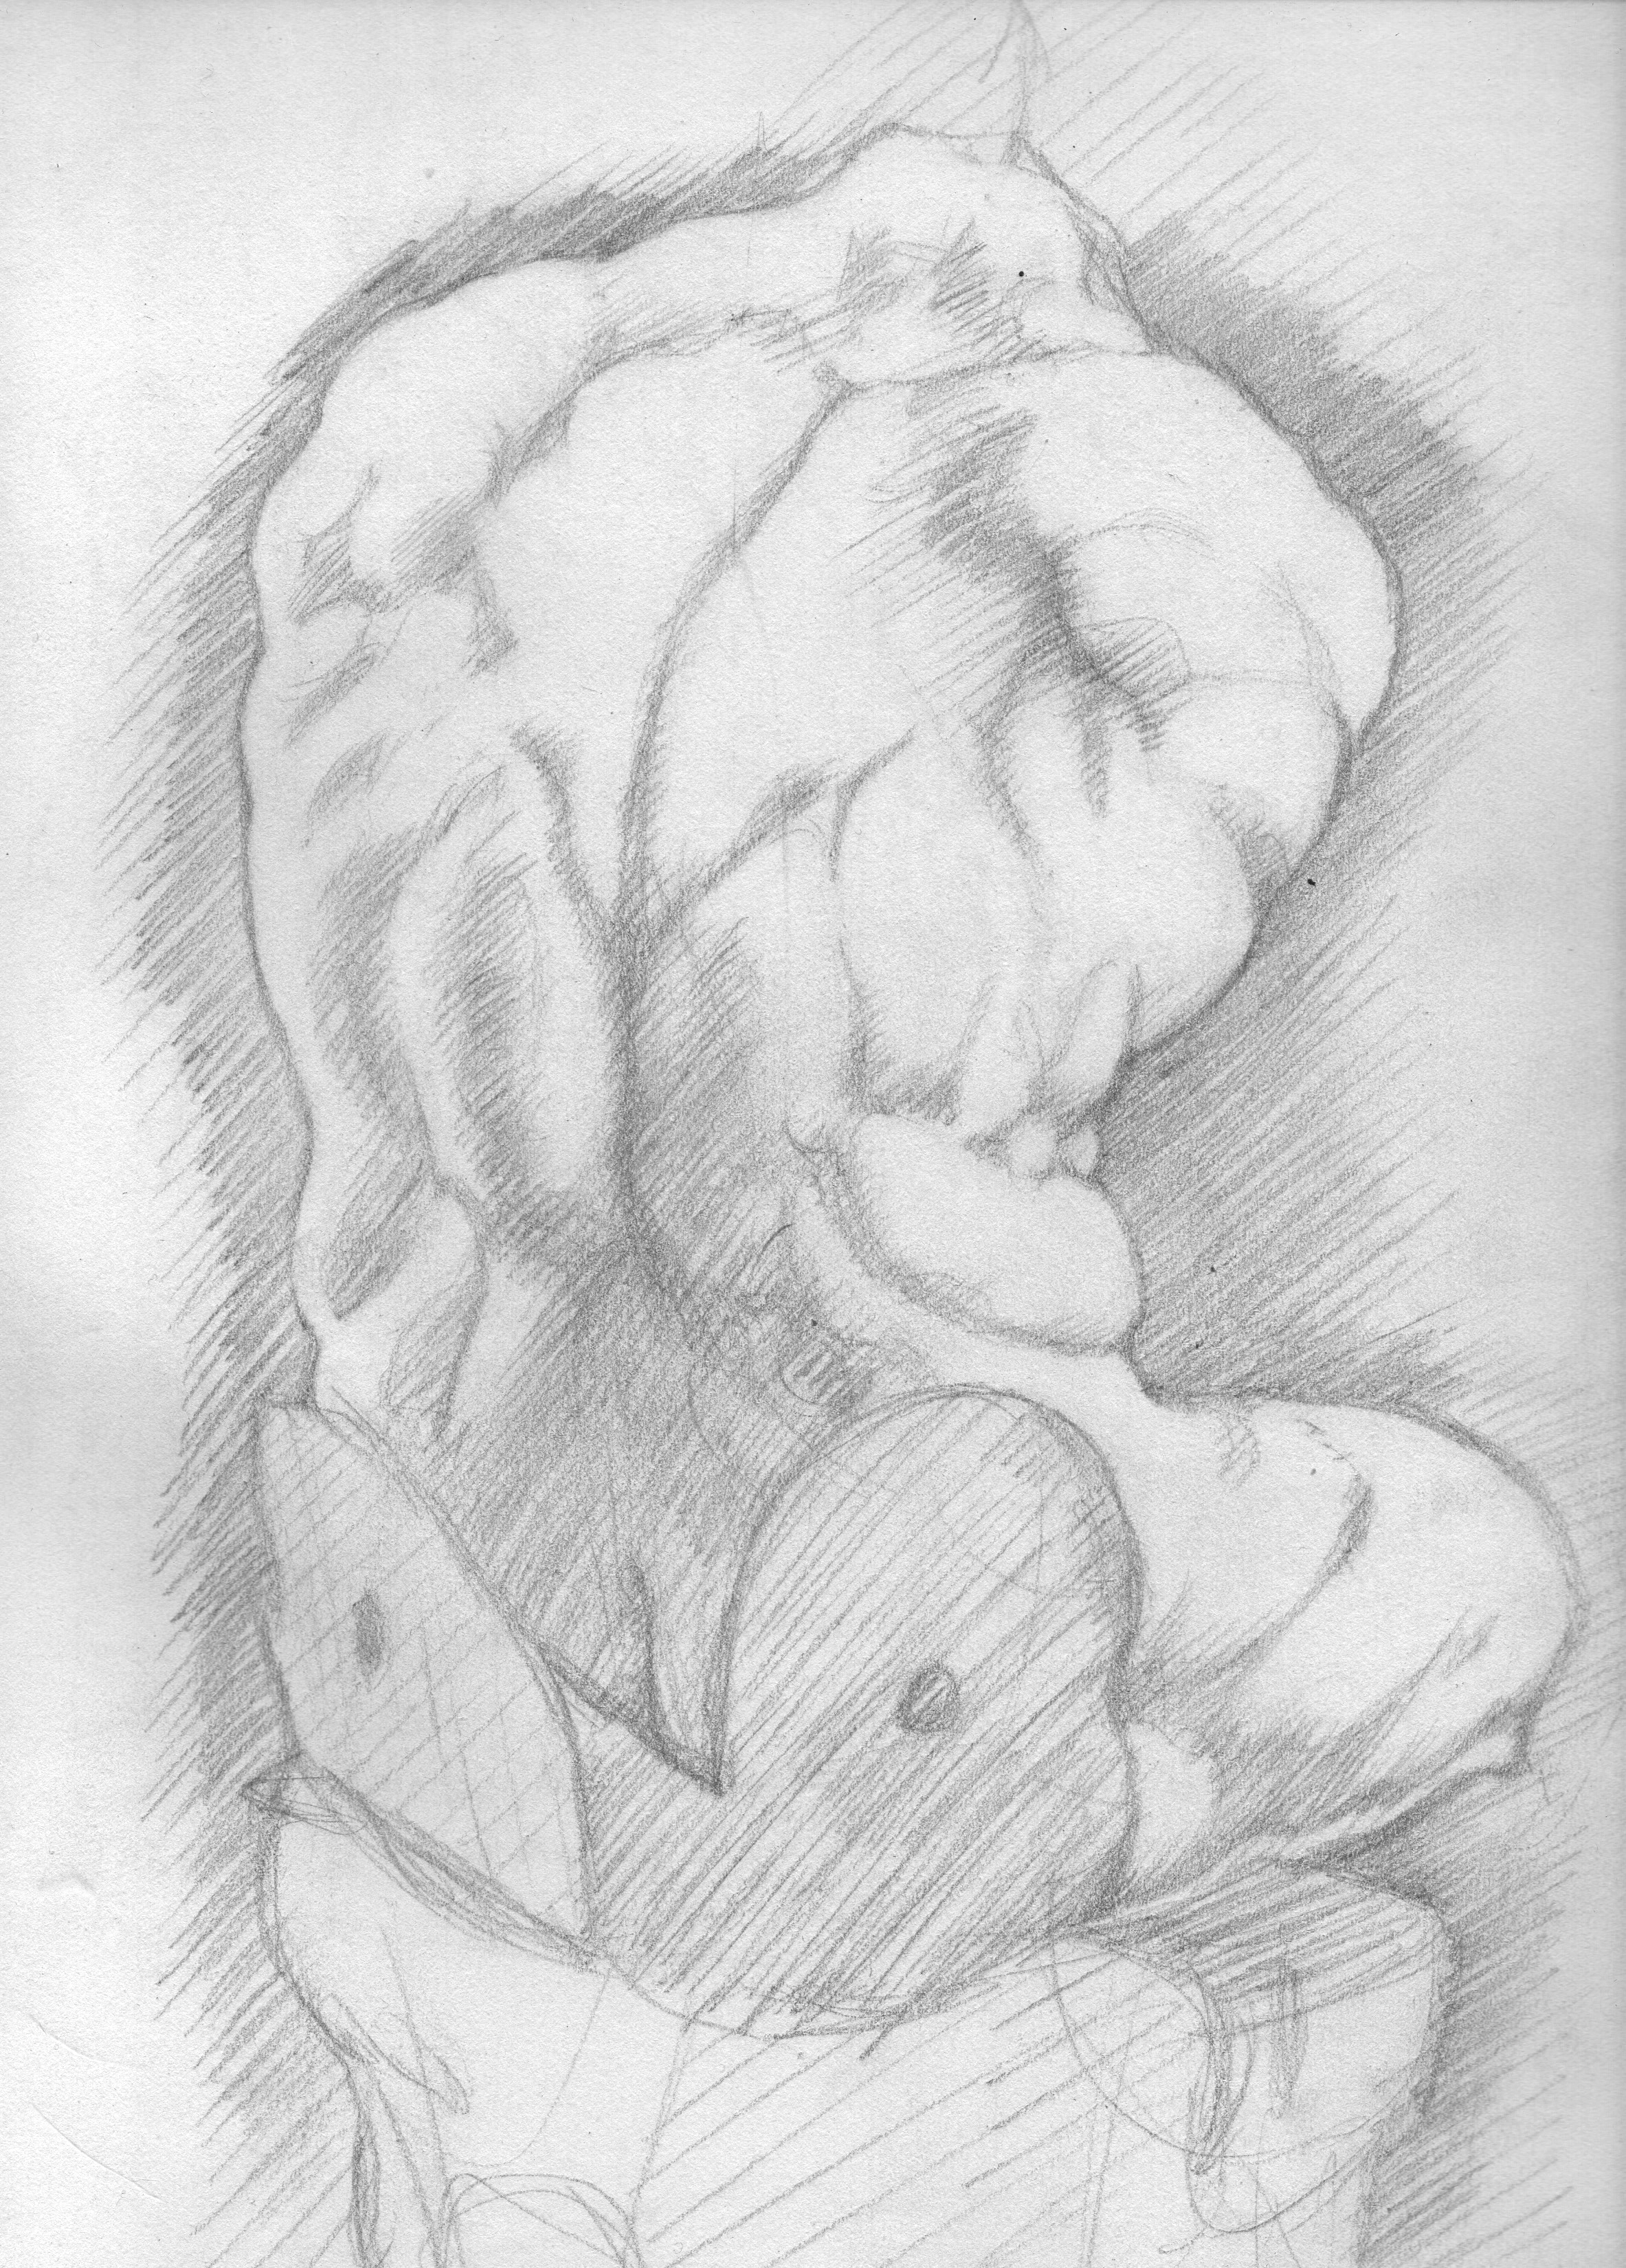 Sketch of the Belvedere Torso - 1995